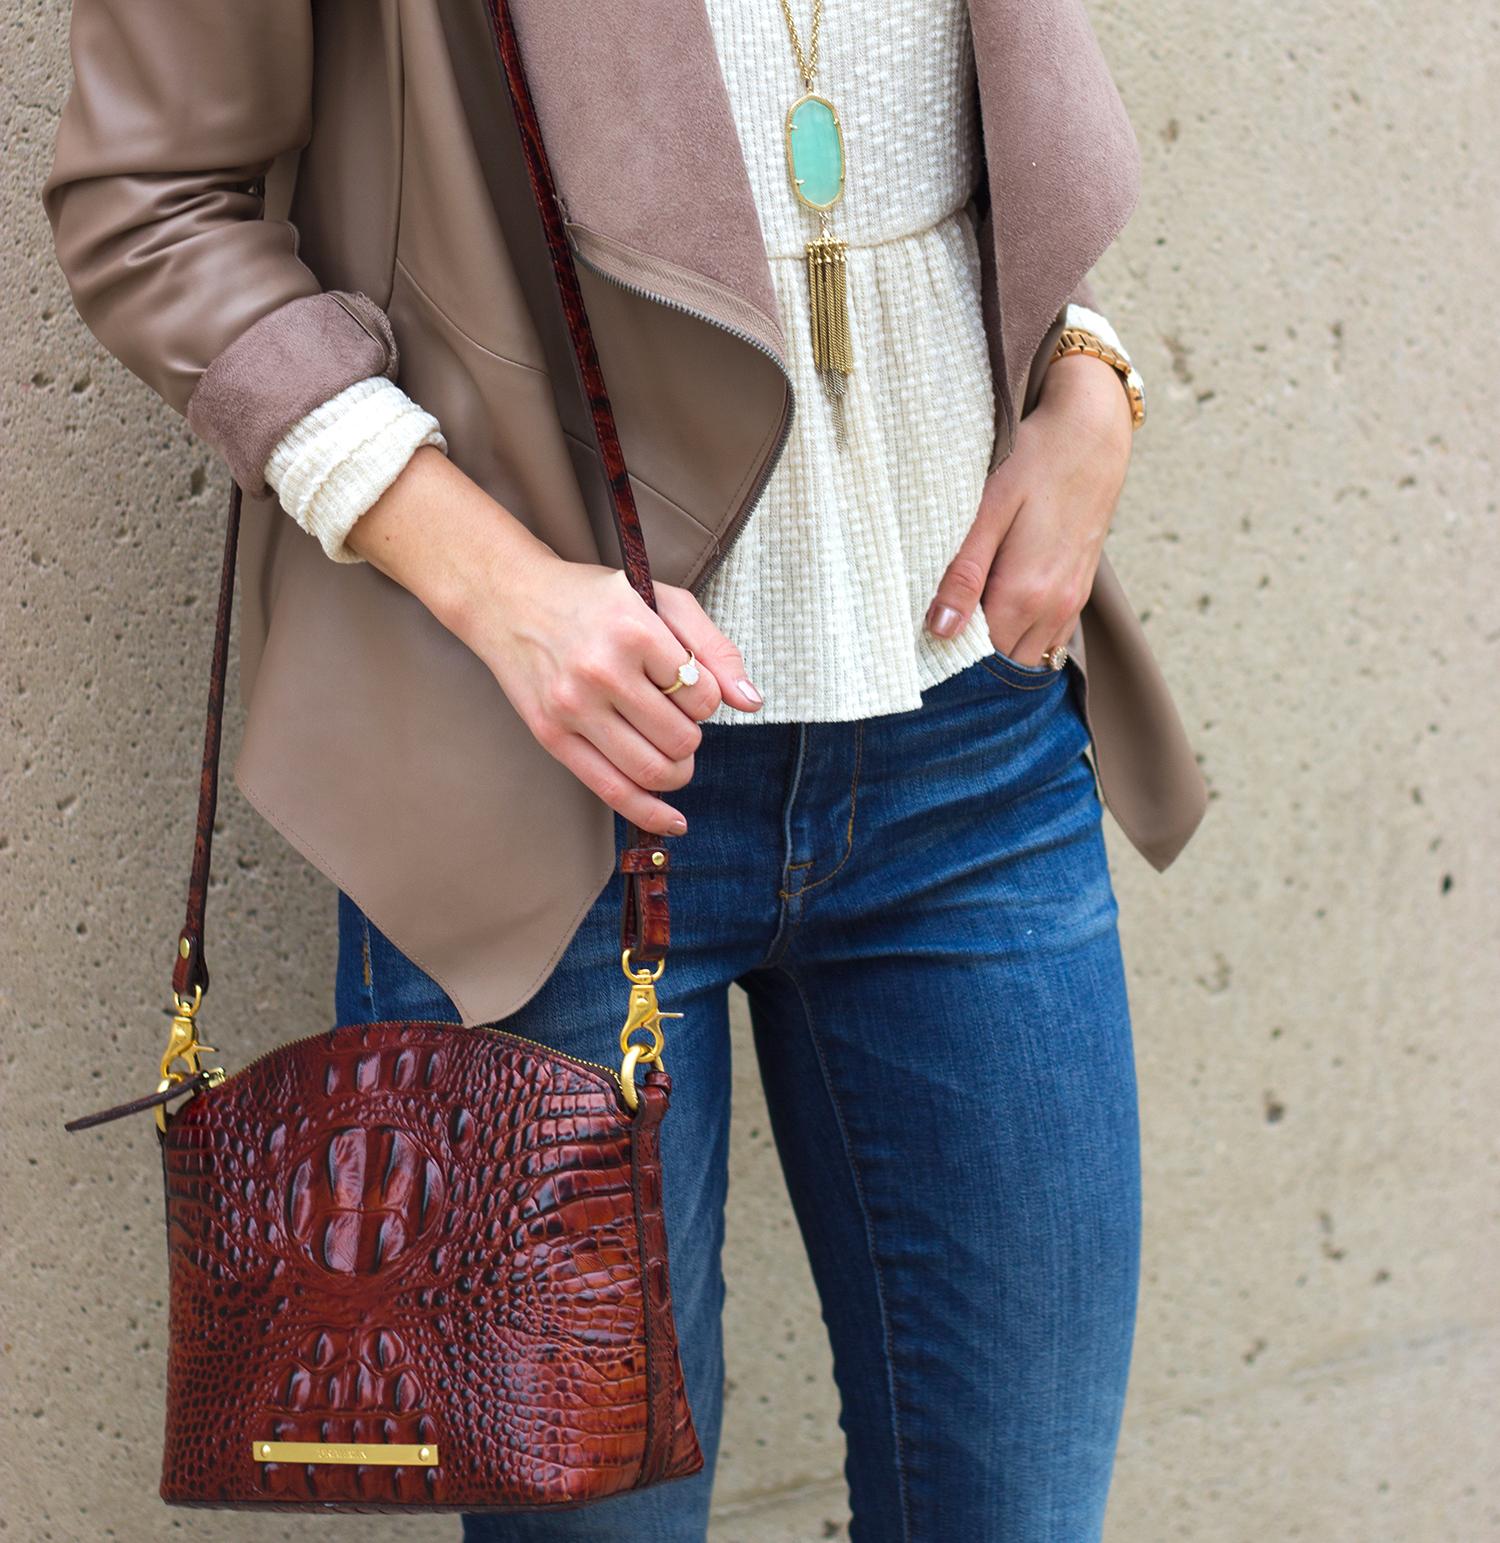 livvyland-blog-olivia-watson-austin-texas-fashion-blogger-madewell-skinny-jeans-bb-dakota-bradford-tan-draped-front-jacket-brahmin-toms-majorca-booties-6